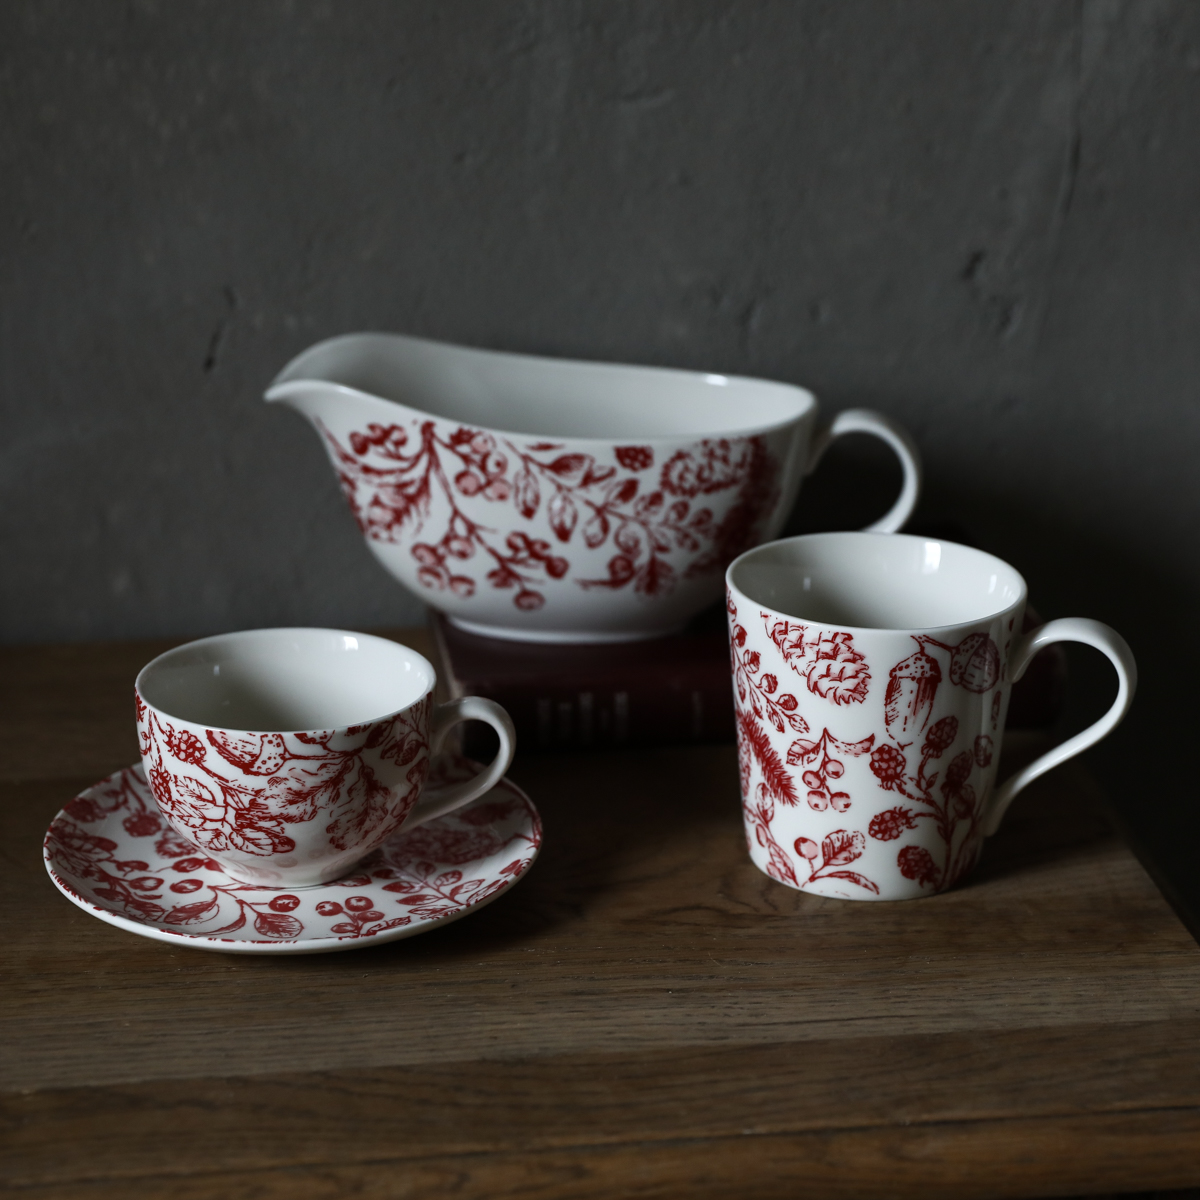 W1962英国复古英式下午茶浆果植物咖啡杯碟/茶杯马克杯酱料壶奶壶限1000张券